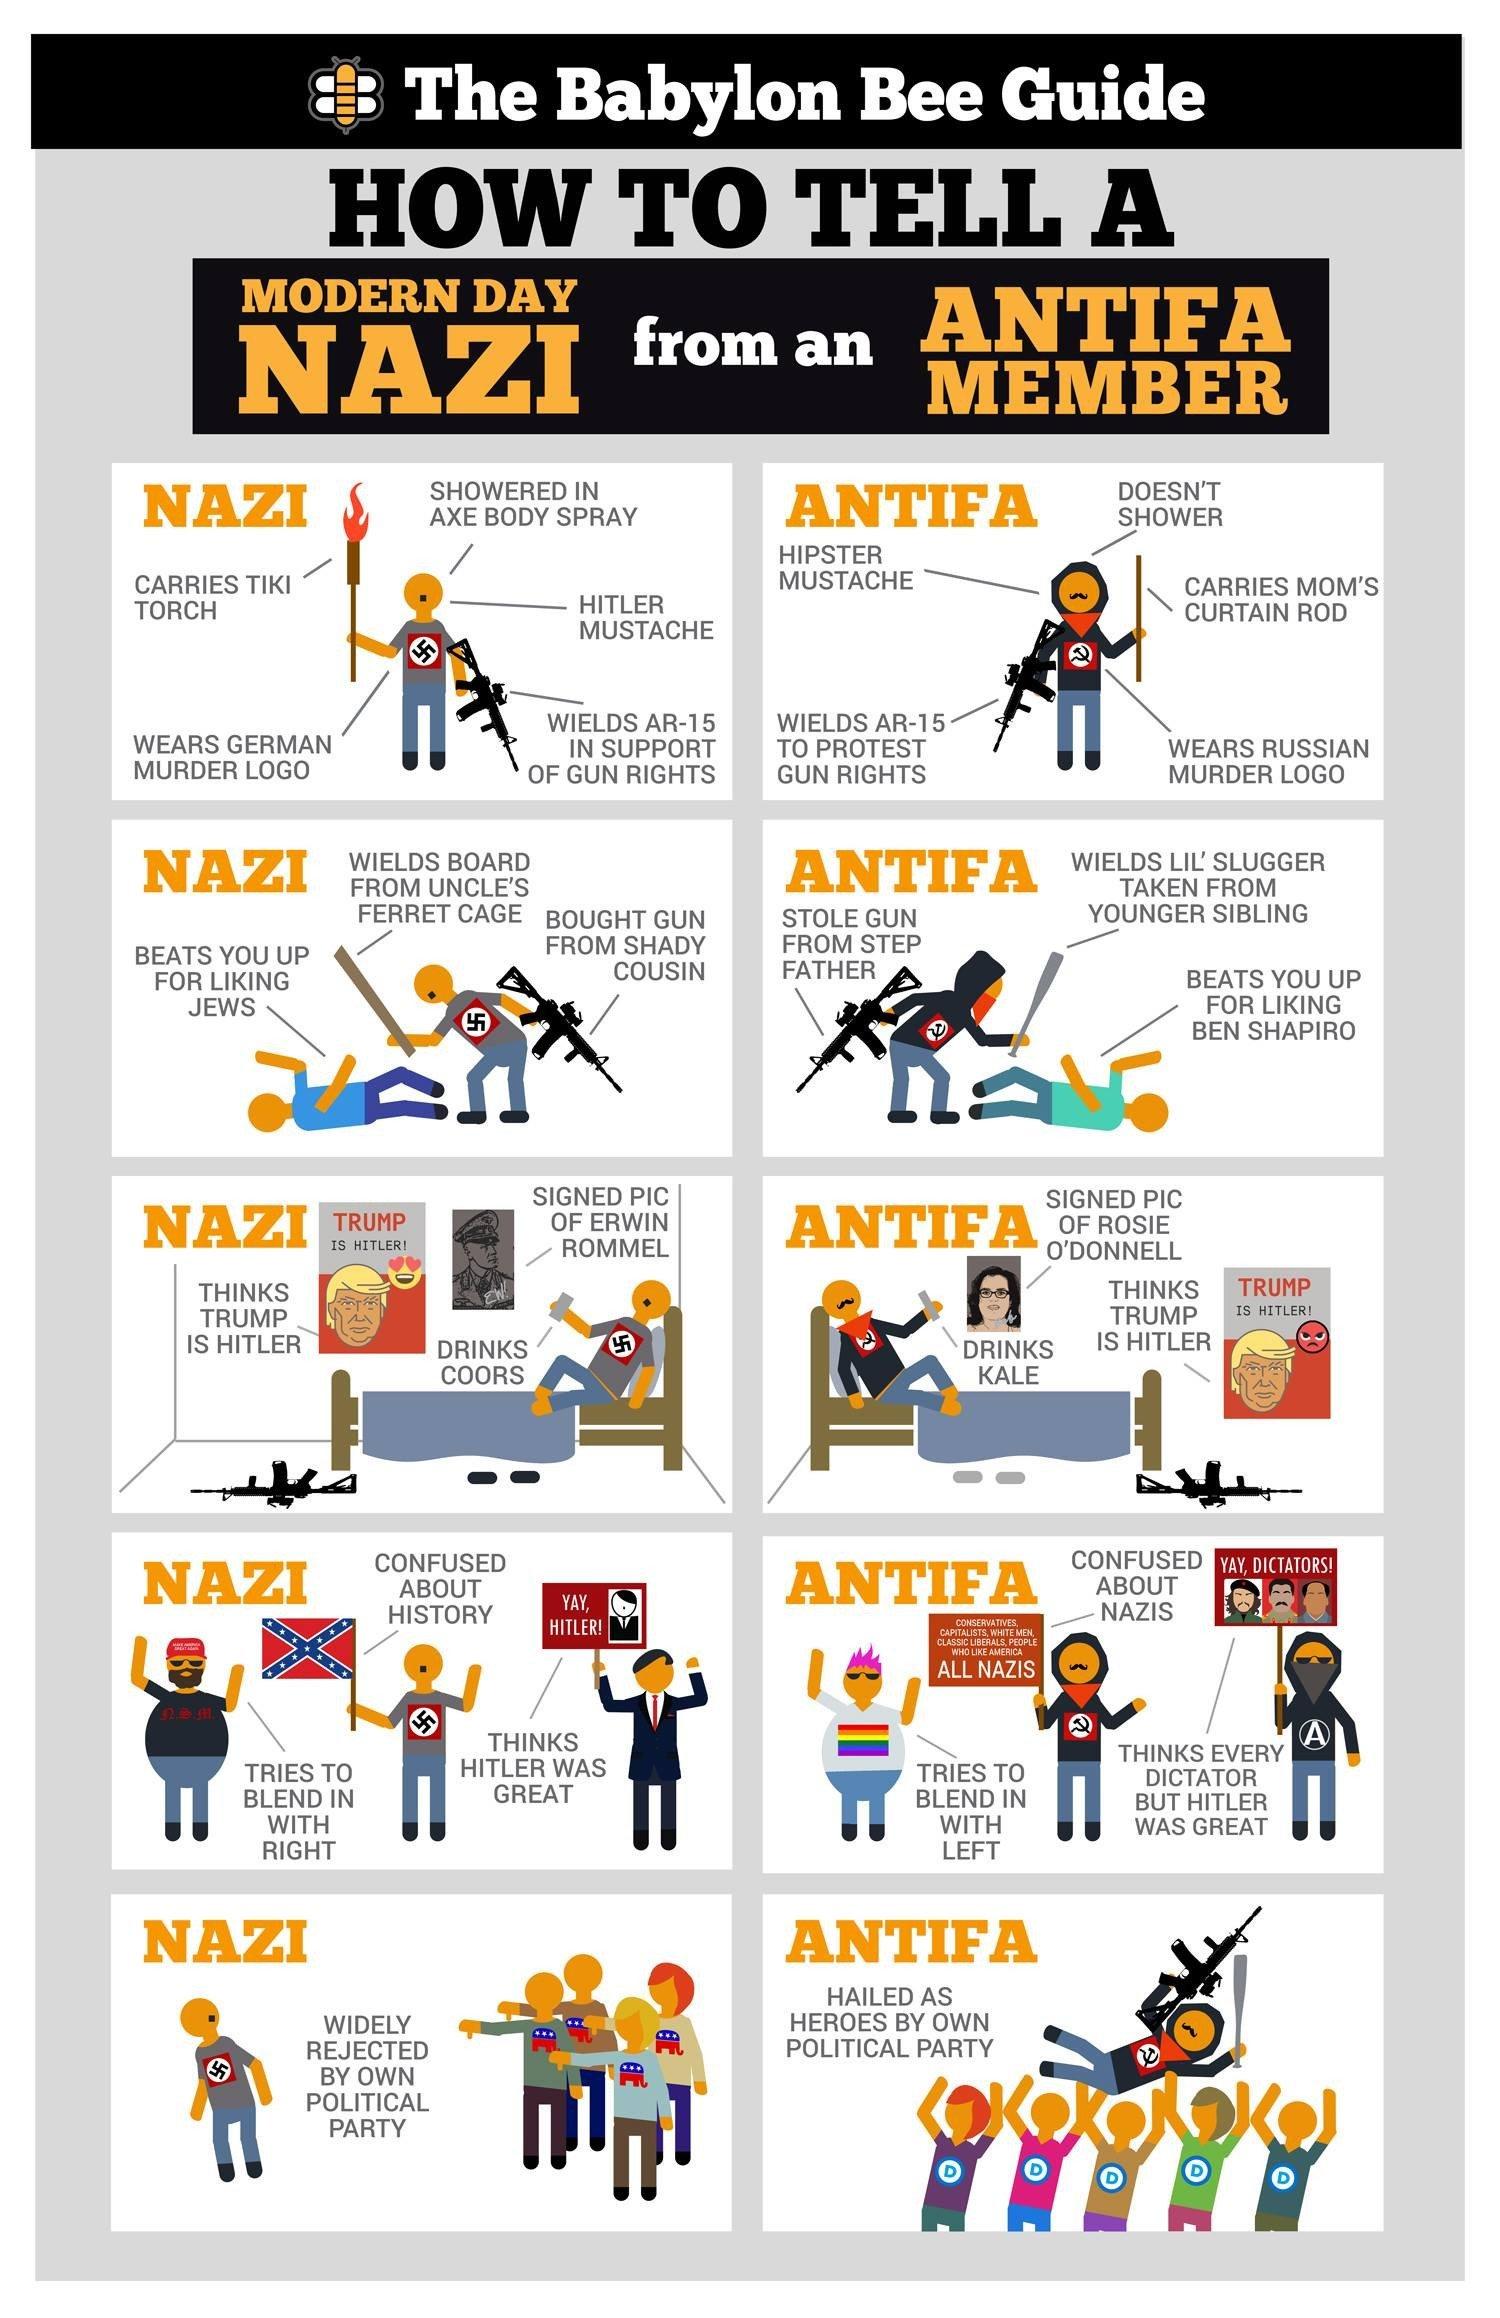 how to tell nazi from antifa member